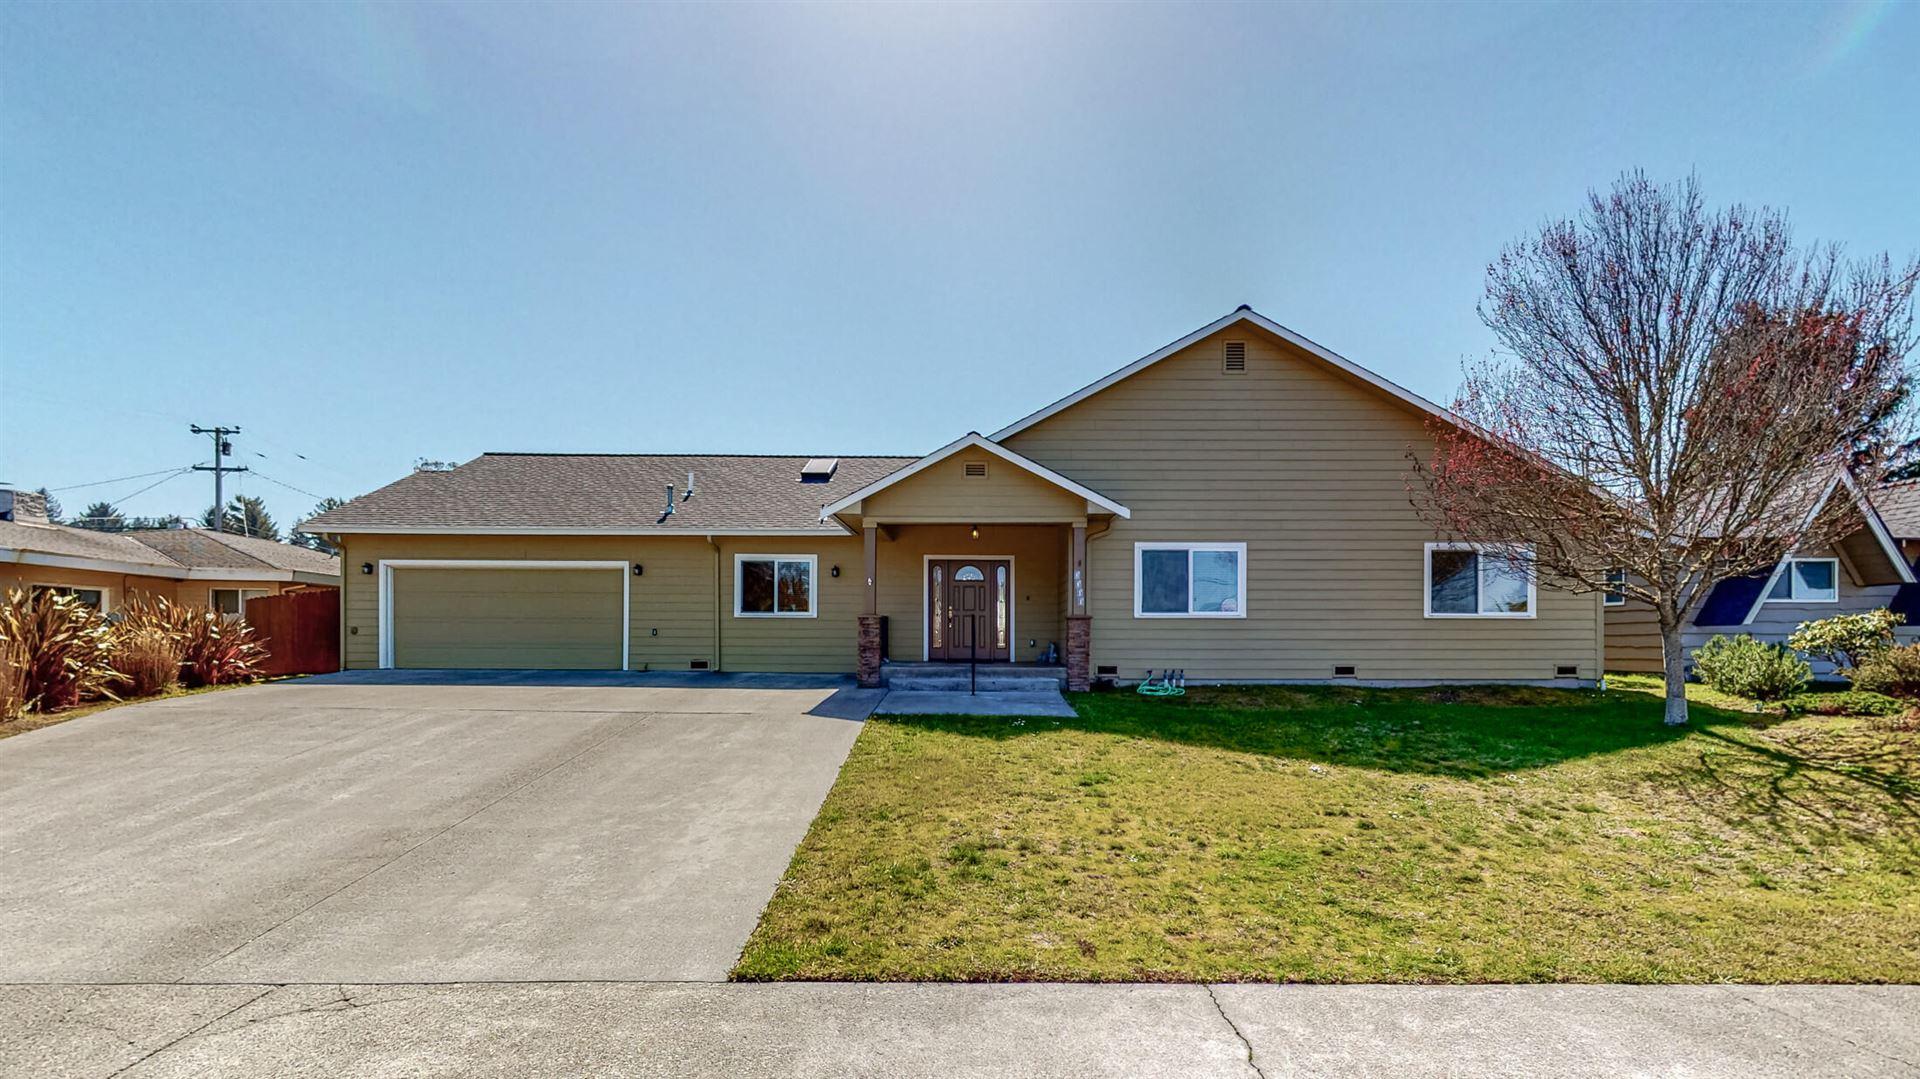 2300 Norman Court, Eureka, CA 95503 - MLS#: 258709